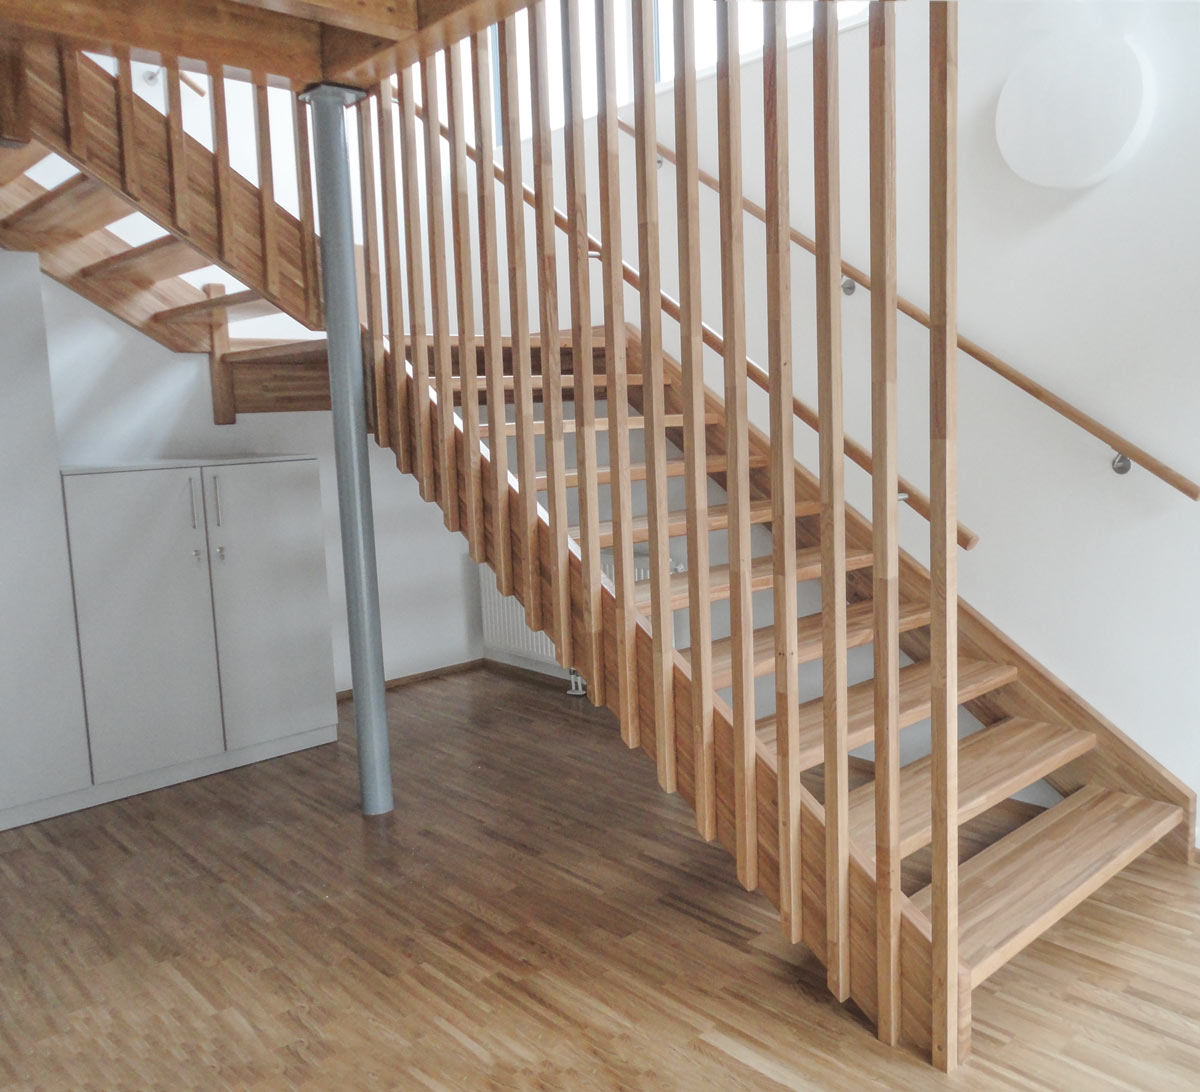 treppen oesterreich tischler wangentreppen 25 marco treppen. Black Bedroom Furniture Sets. Home Design Ideas